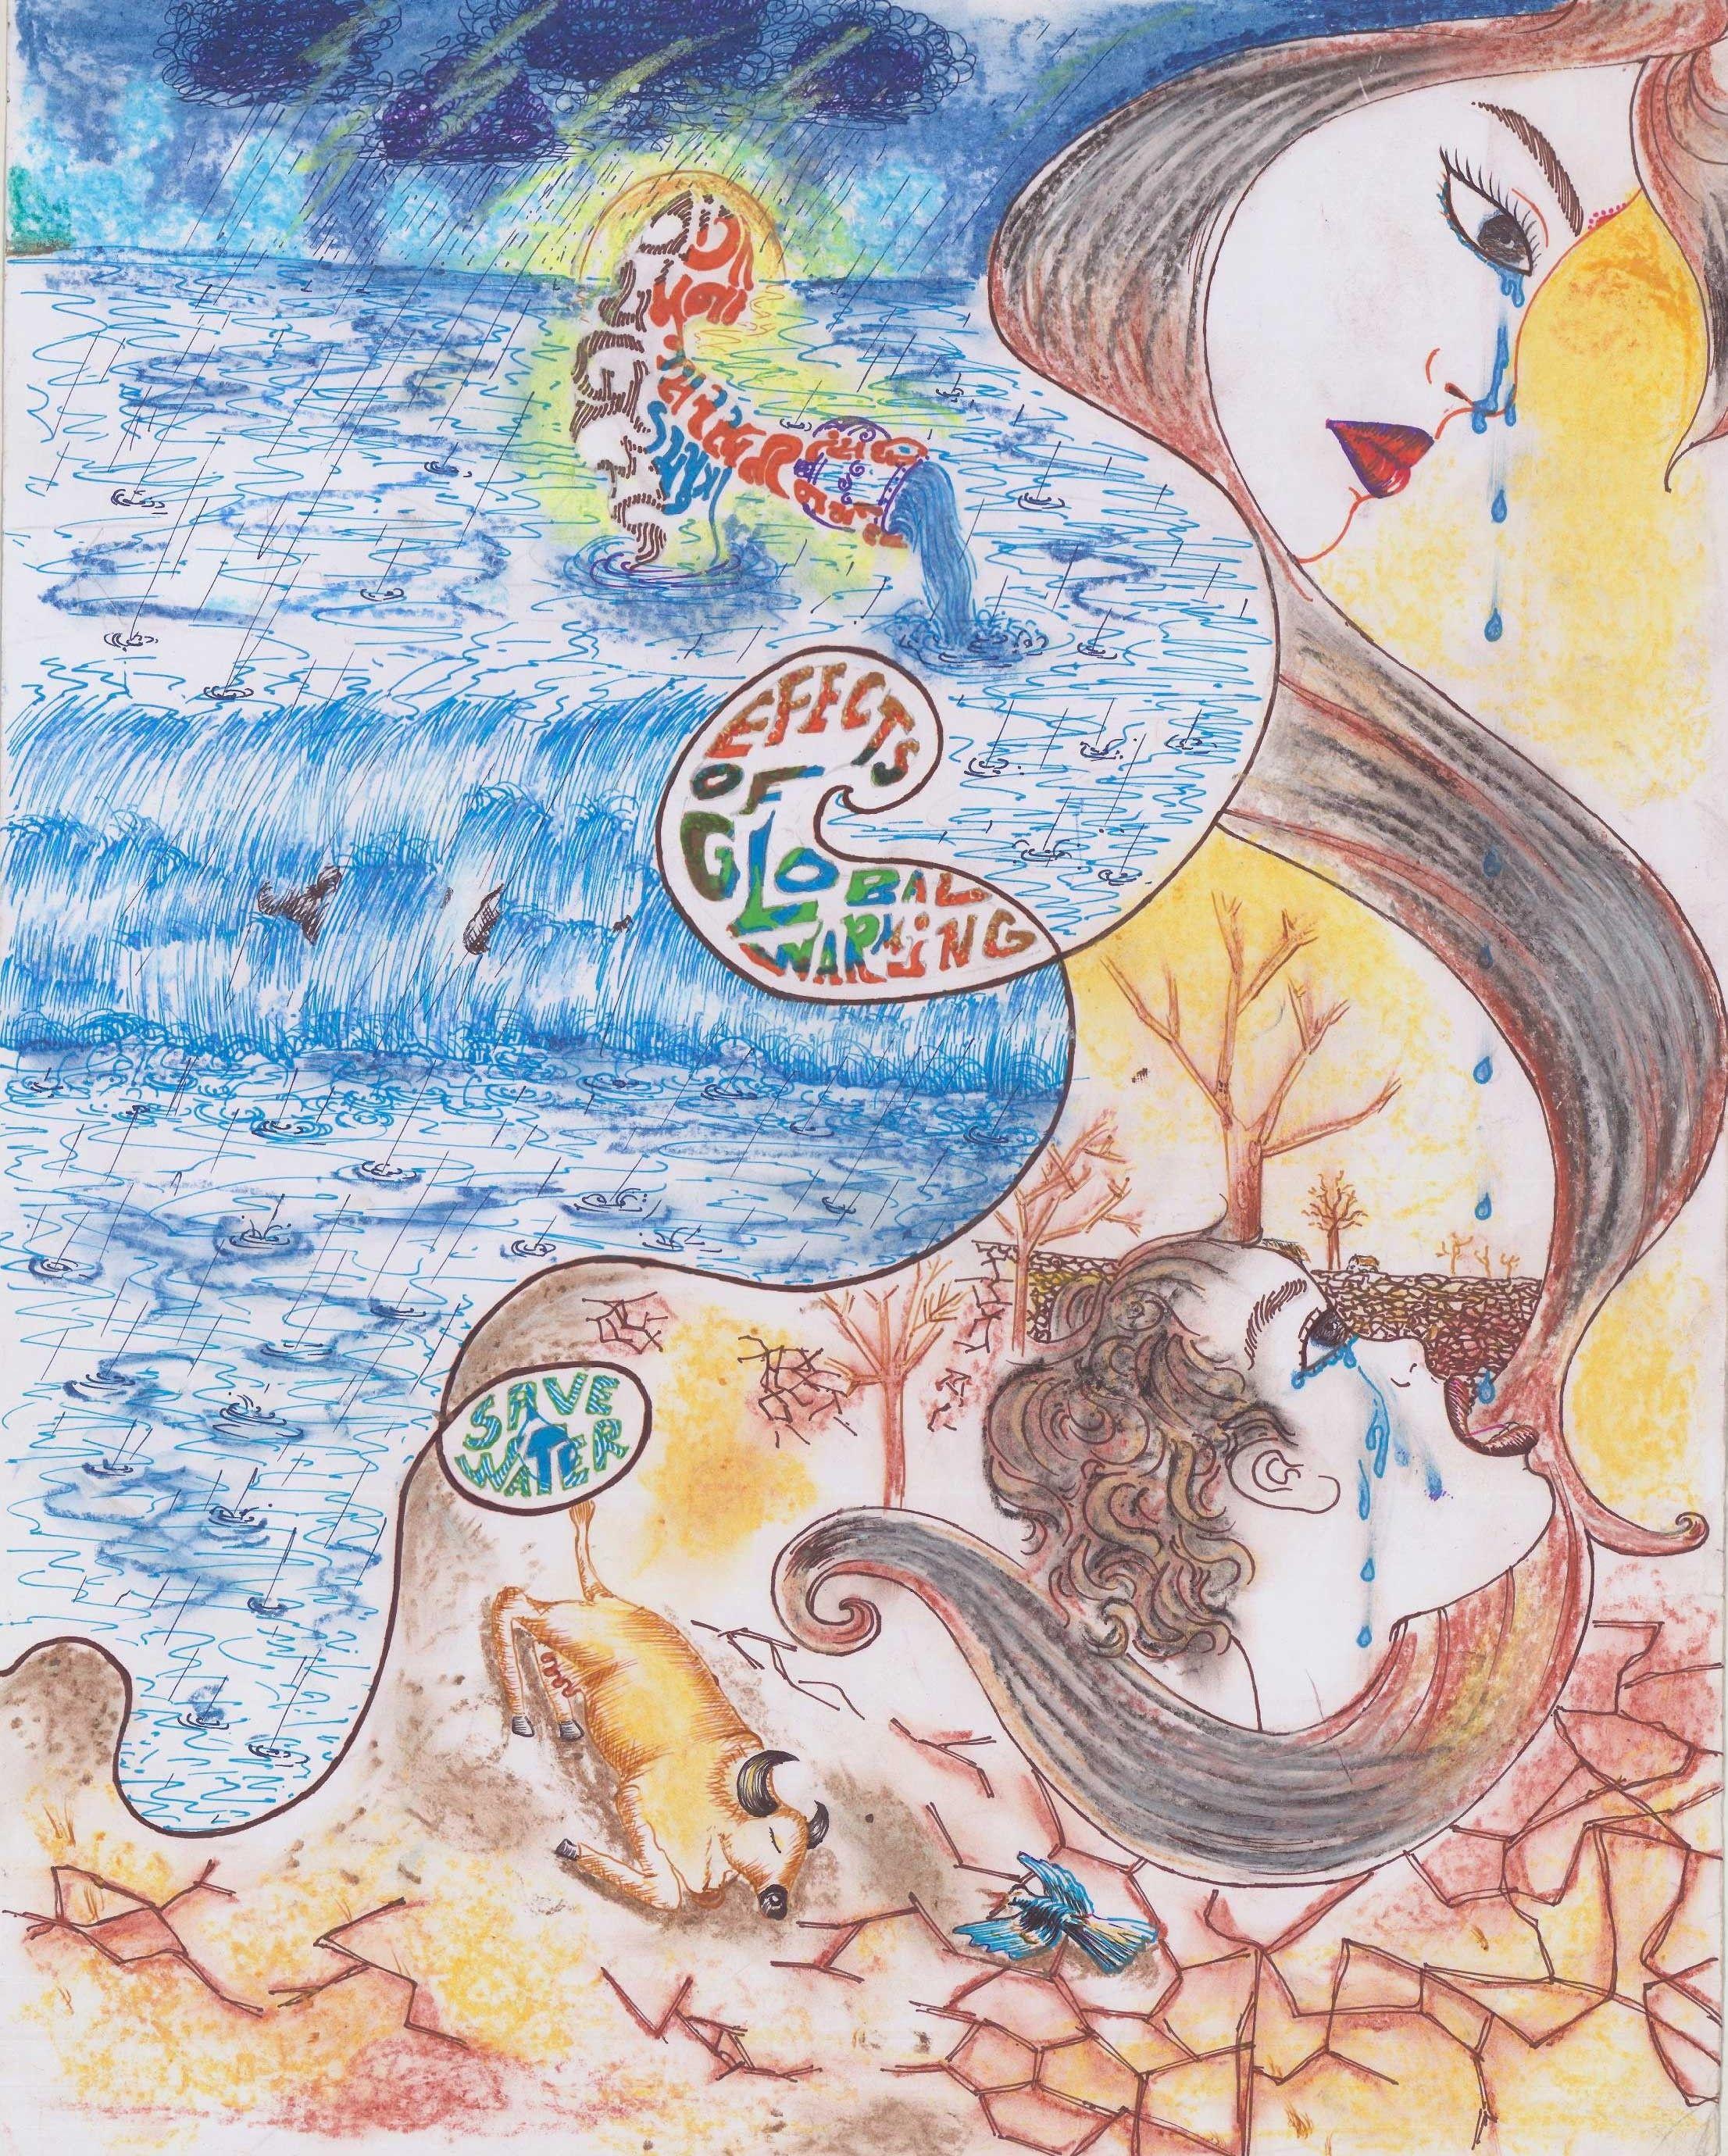 Poster on Water Conservation by Kathiriya Shivani ...